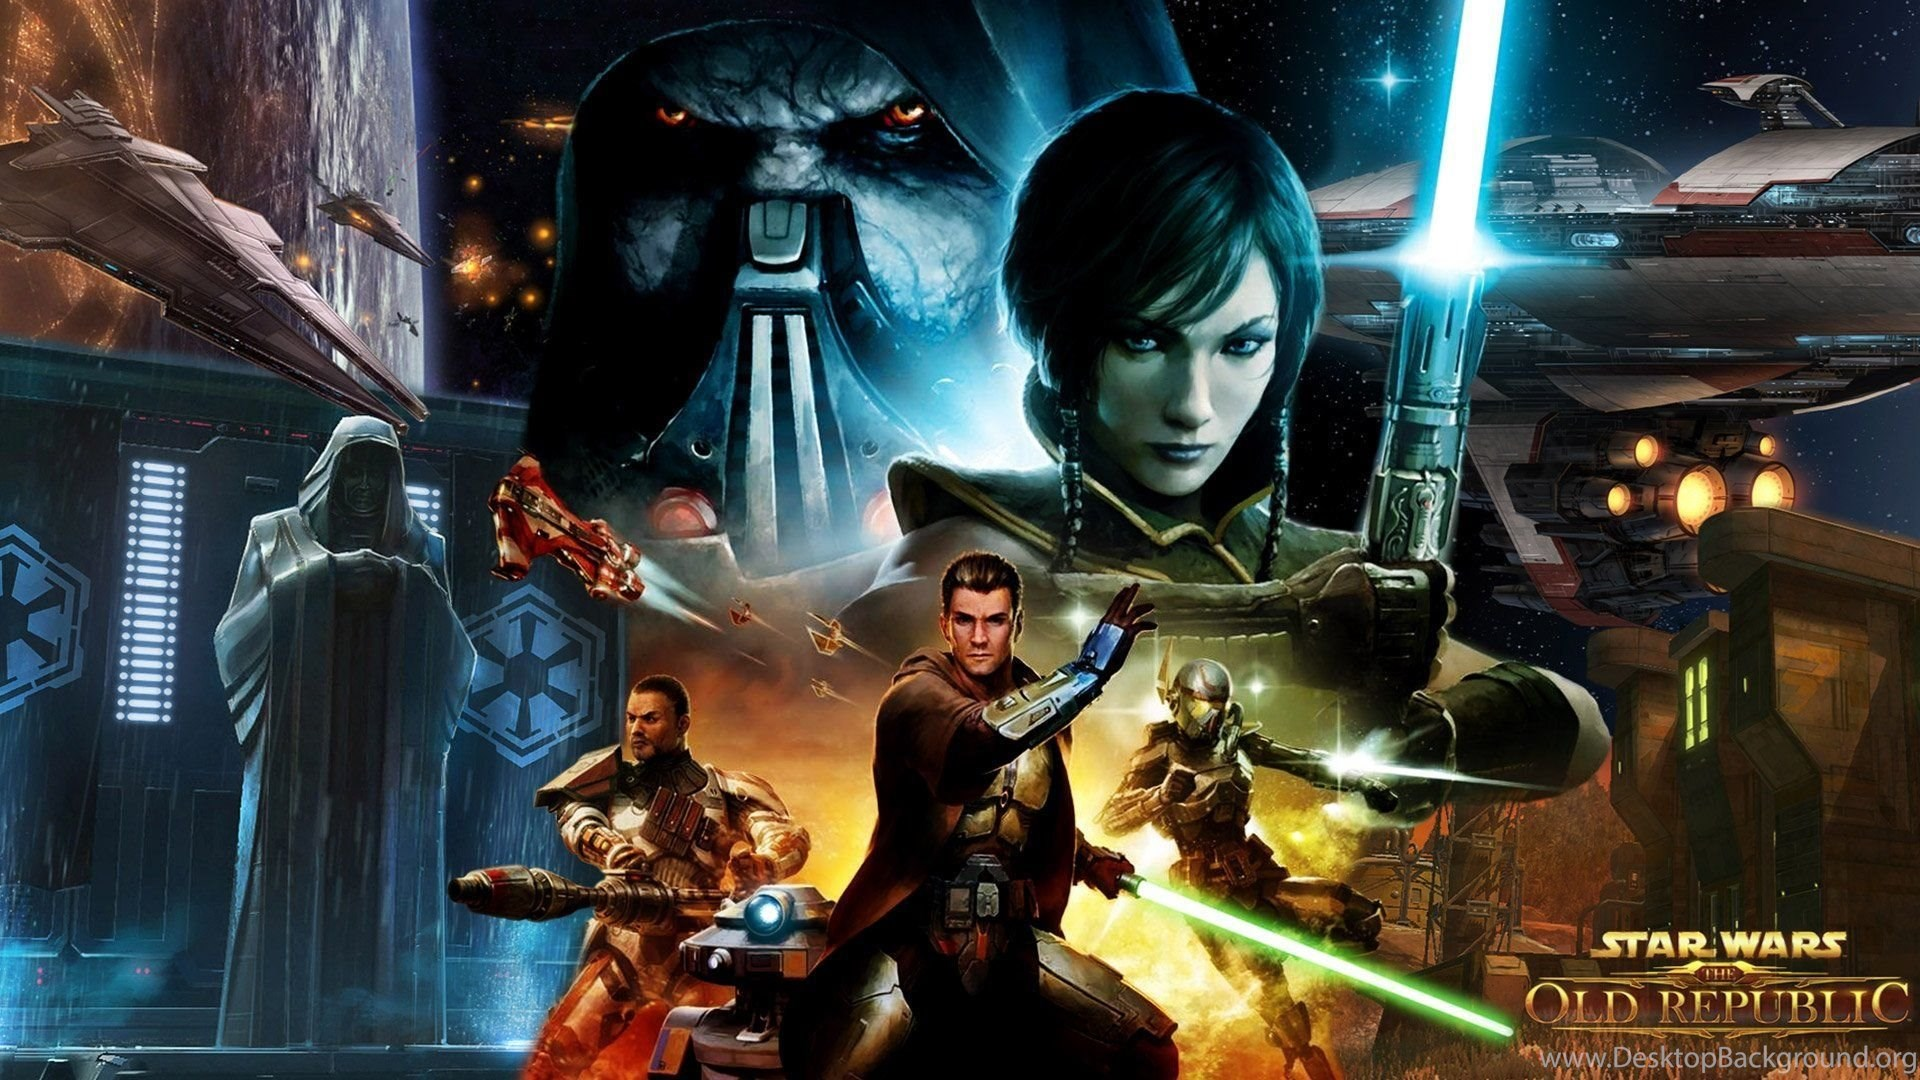 Star Wars The Old Republic Download Wallpapers Walldevil Best Desktop Background